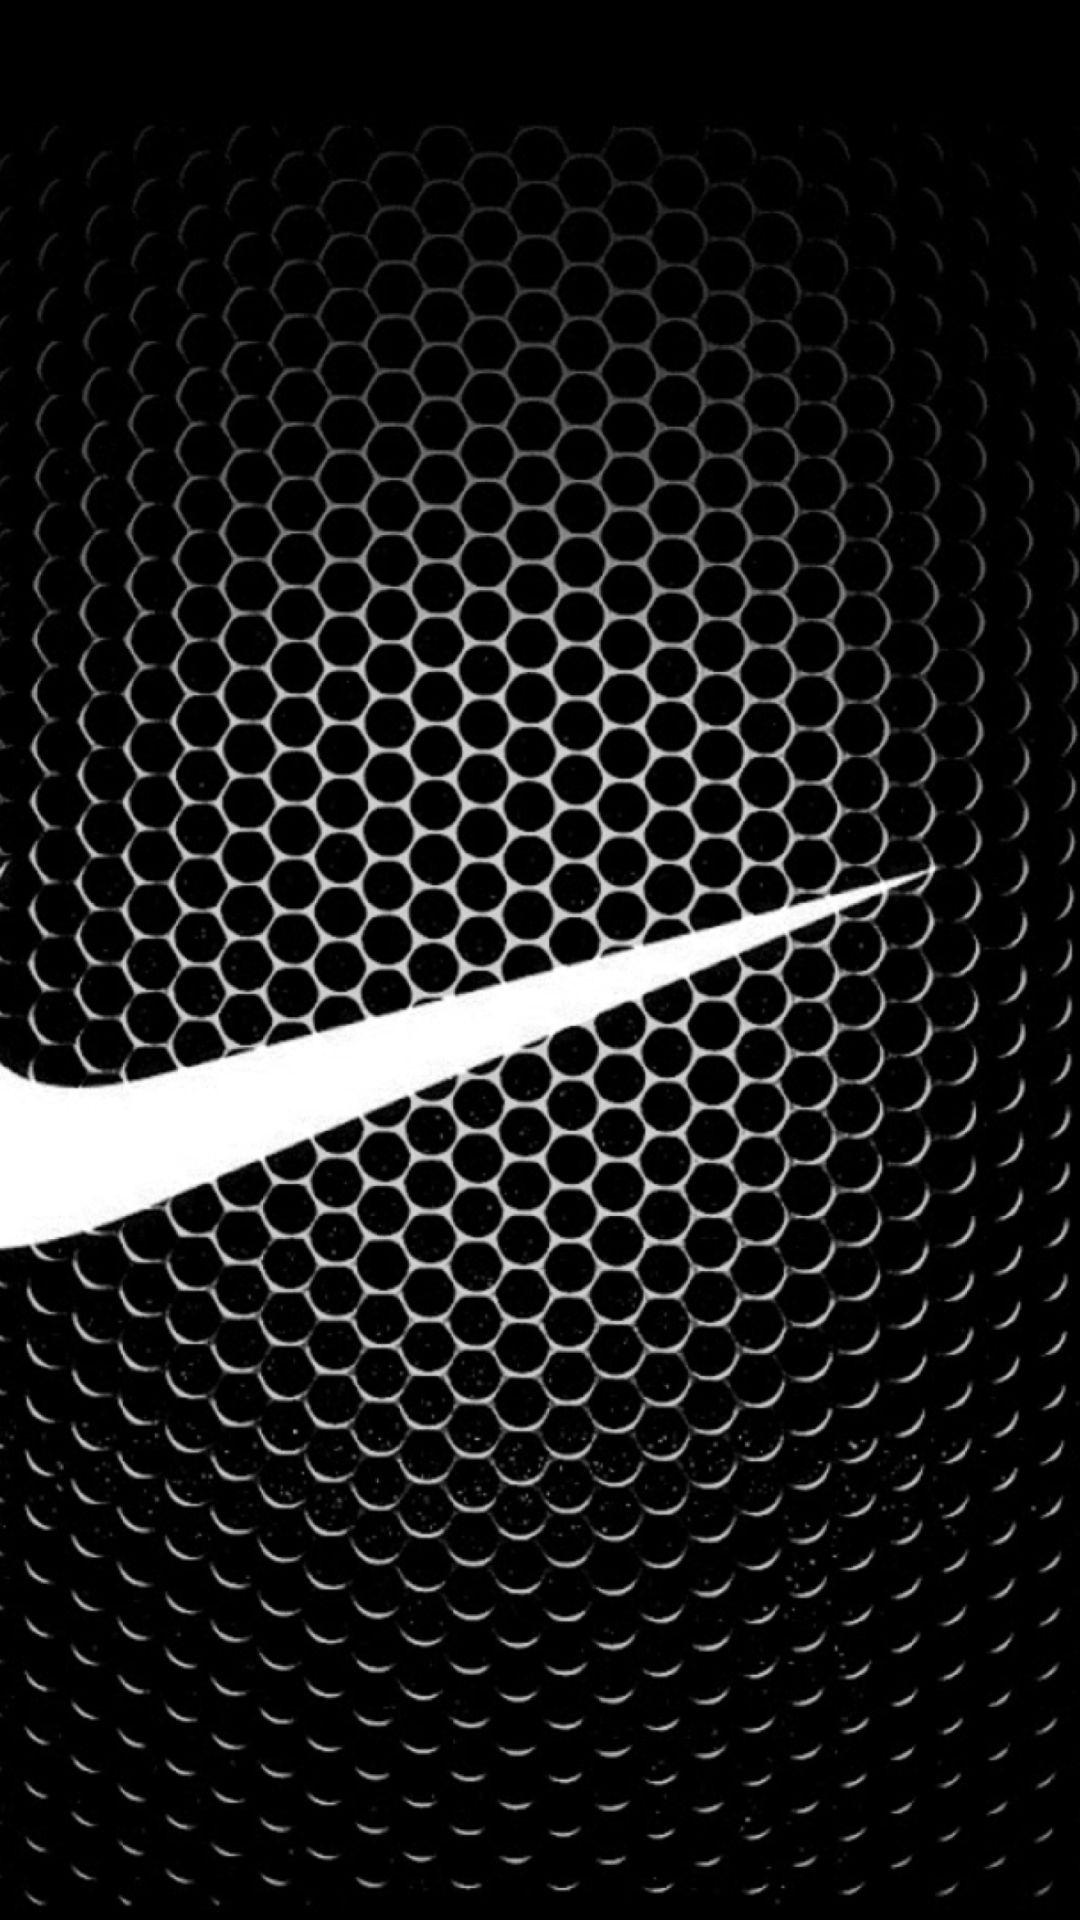 Wallpapers Iphone Nike , Wallpaper Cave